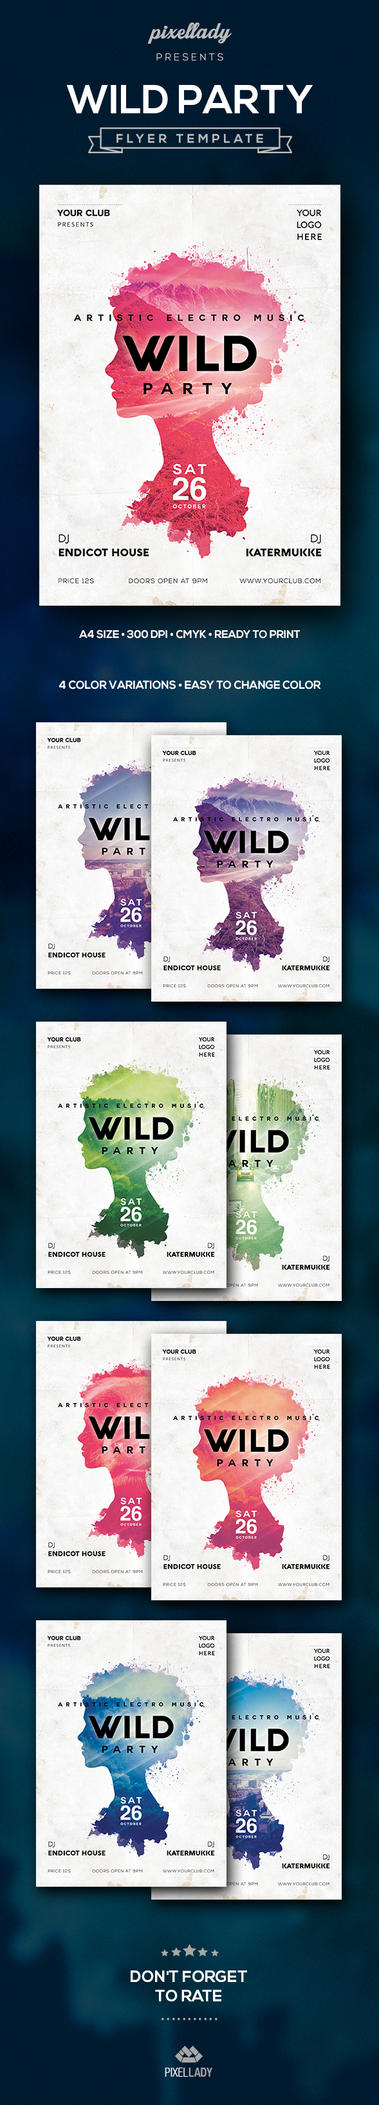 Wild Party Flyer 590 by PixelladyArt